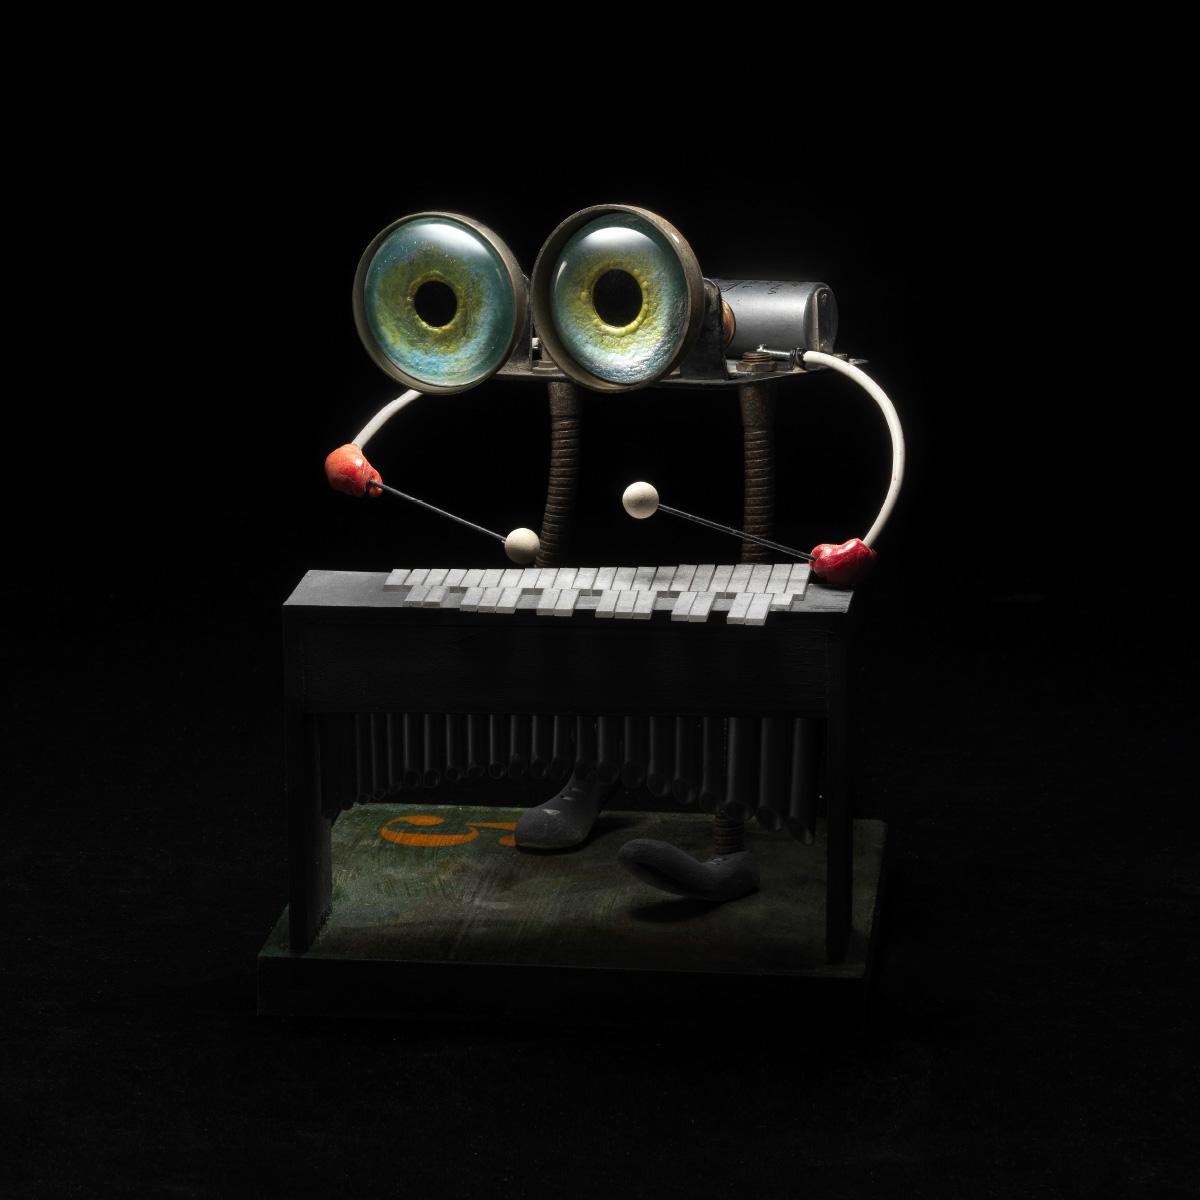 Stefano Prina xylophone eyes Italiano Plurale artist